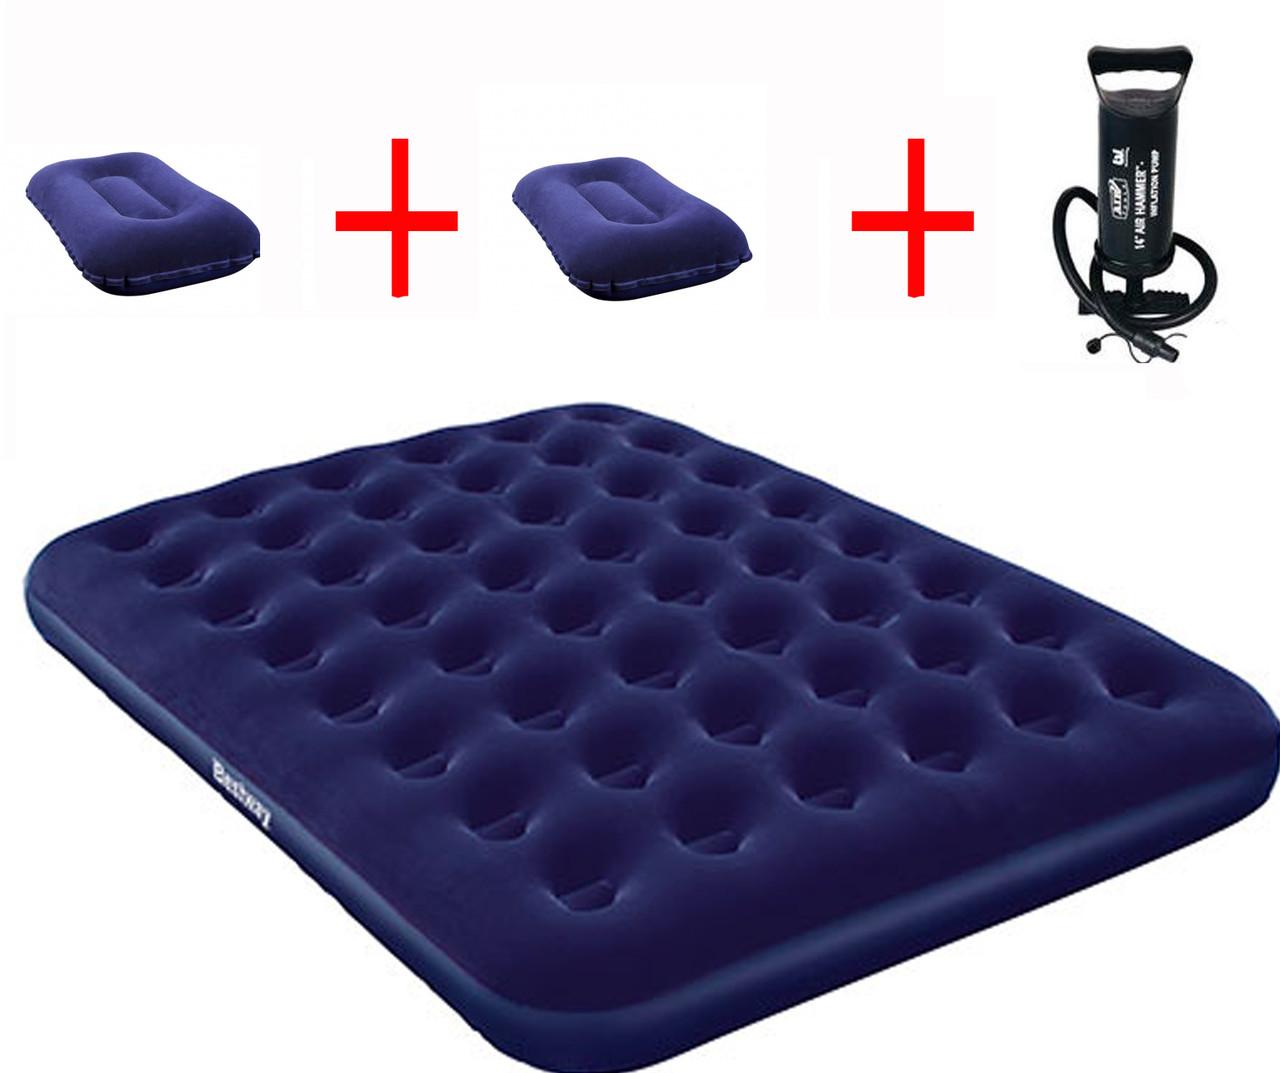 Надувной матрас Bestway 152х203х22 с насосом и двумя подушками